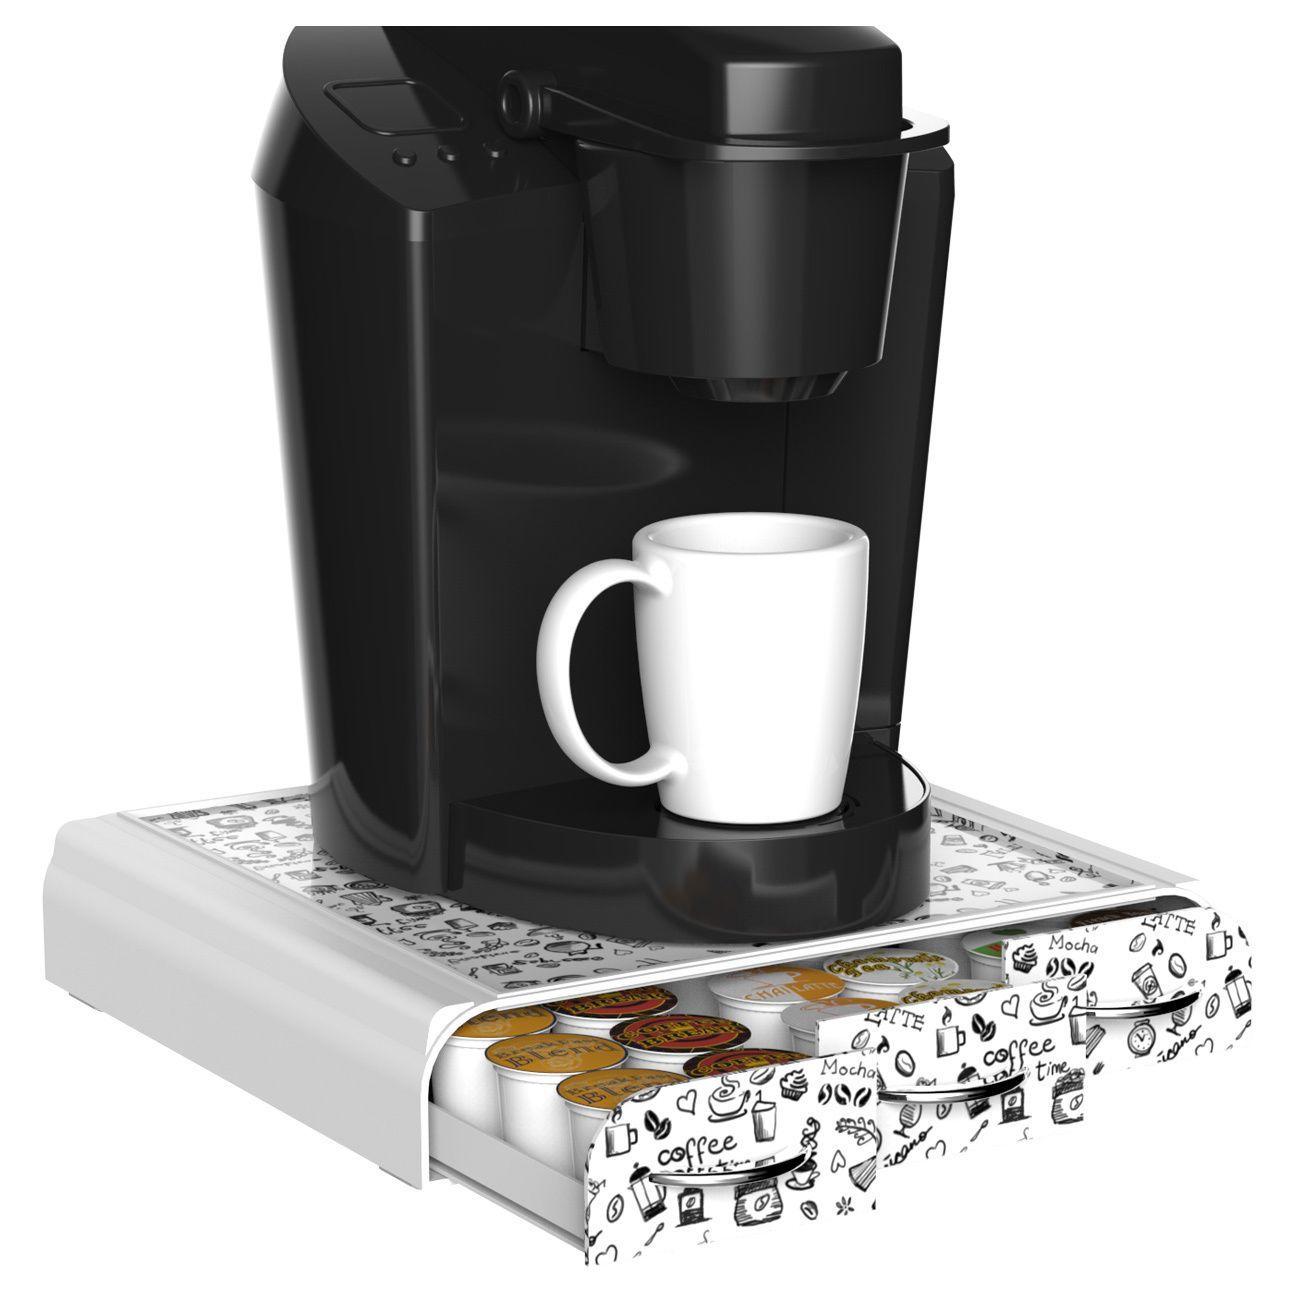 Mindreader Mind Reader Anchor Coffee Pod Triple Drawer 36 Capacity